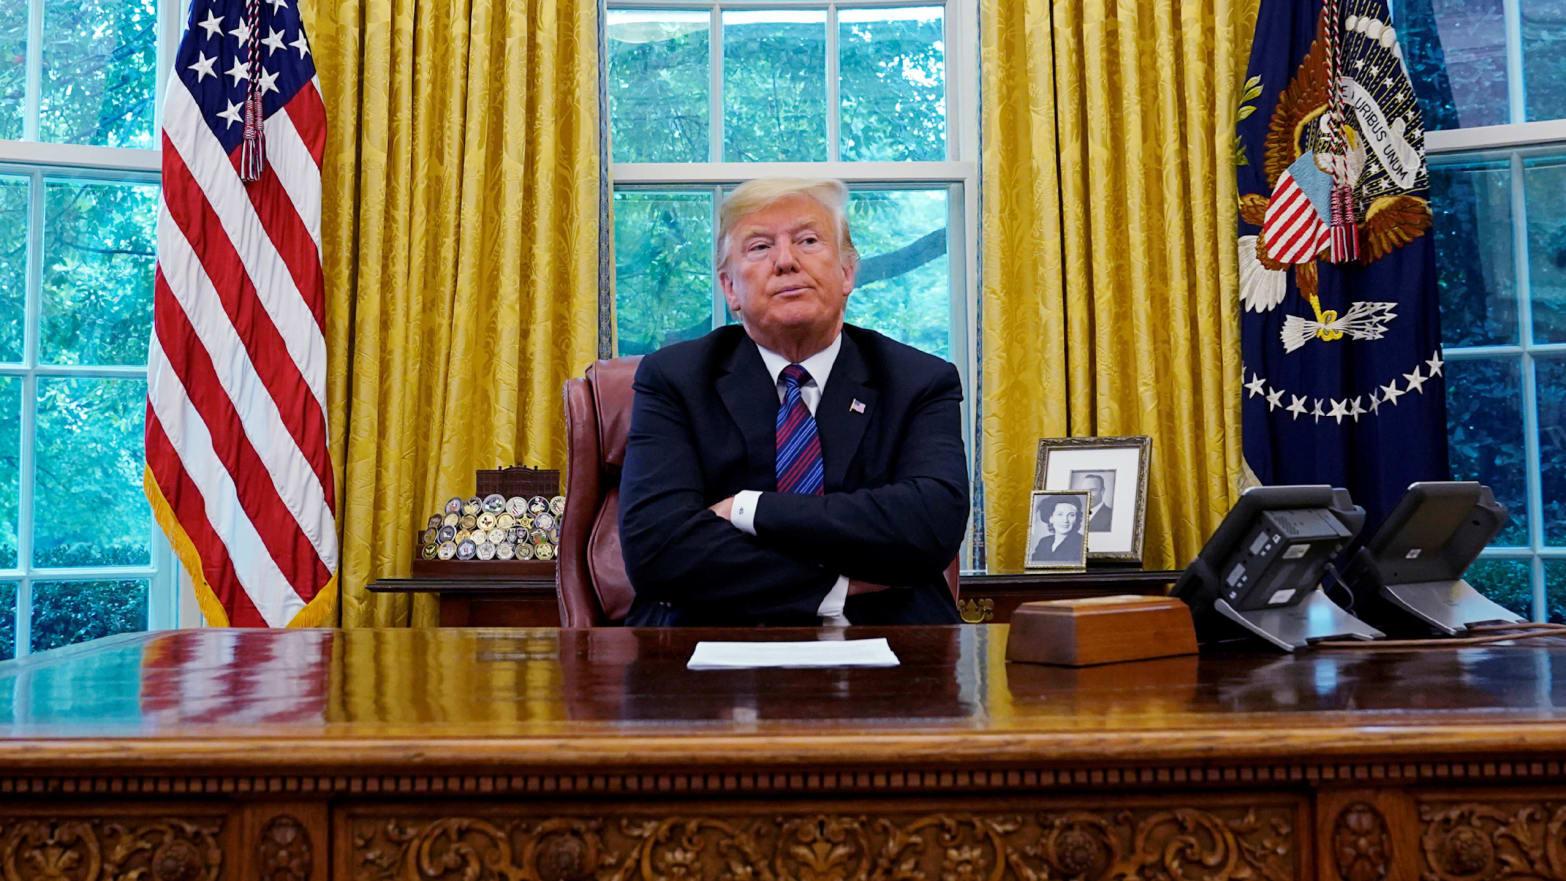 StopTrumpGunControl.com: Oppose Pres. Trump's Plan to Enact New Gun Control